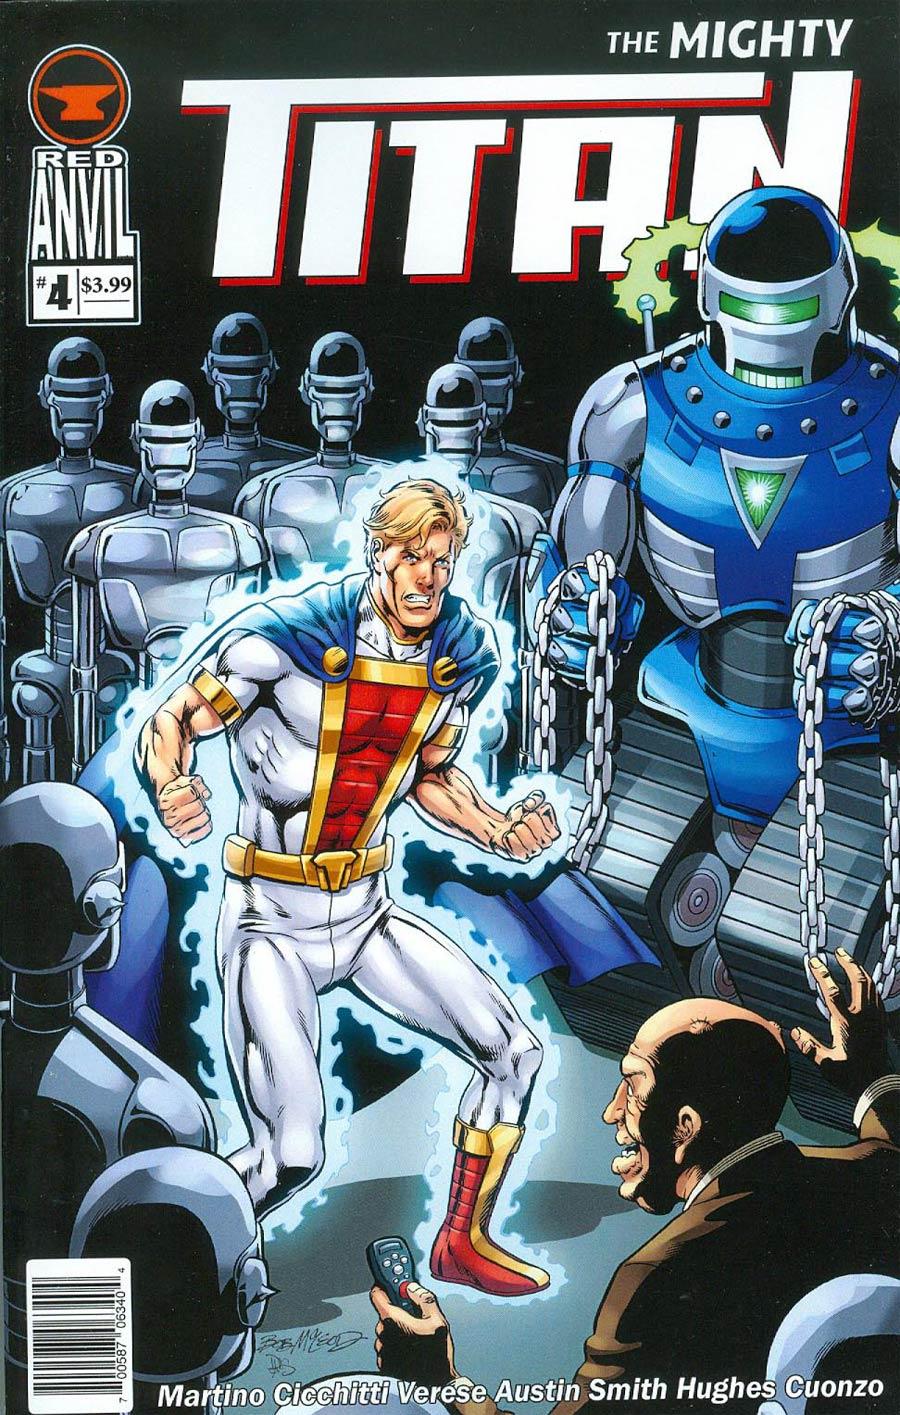 Mighty Titan #4